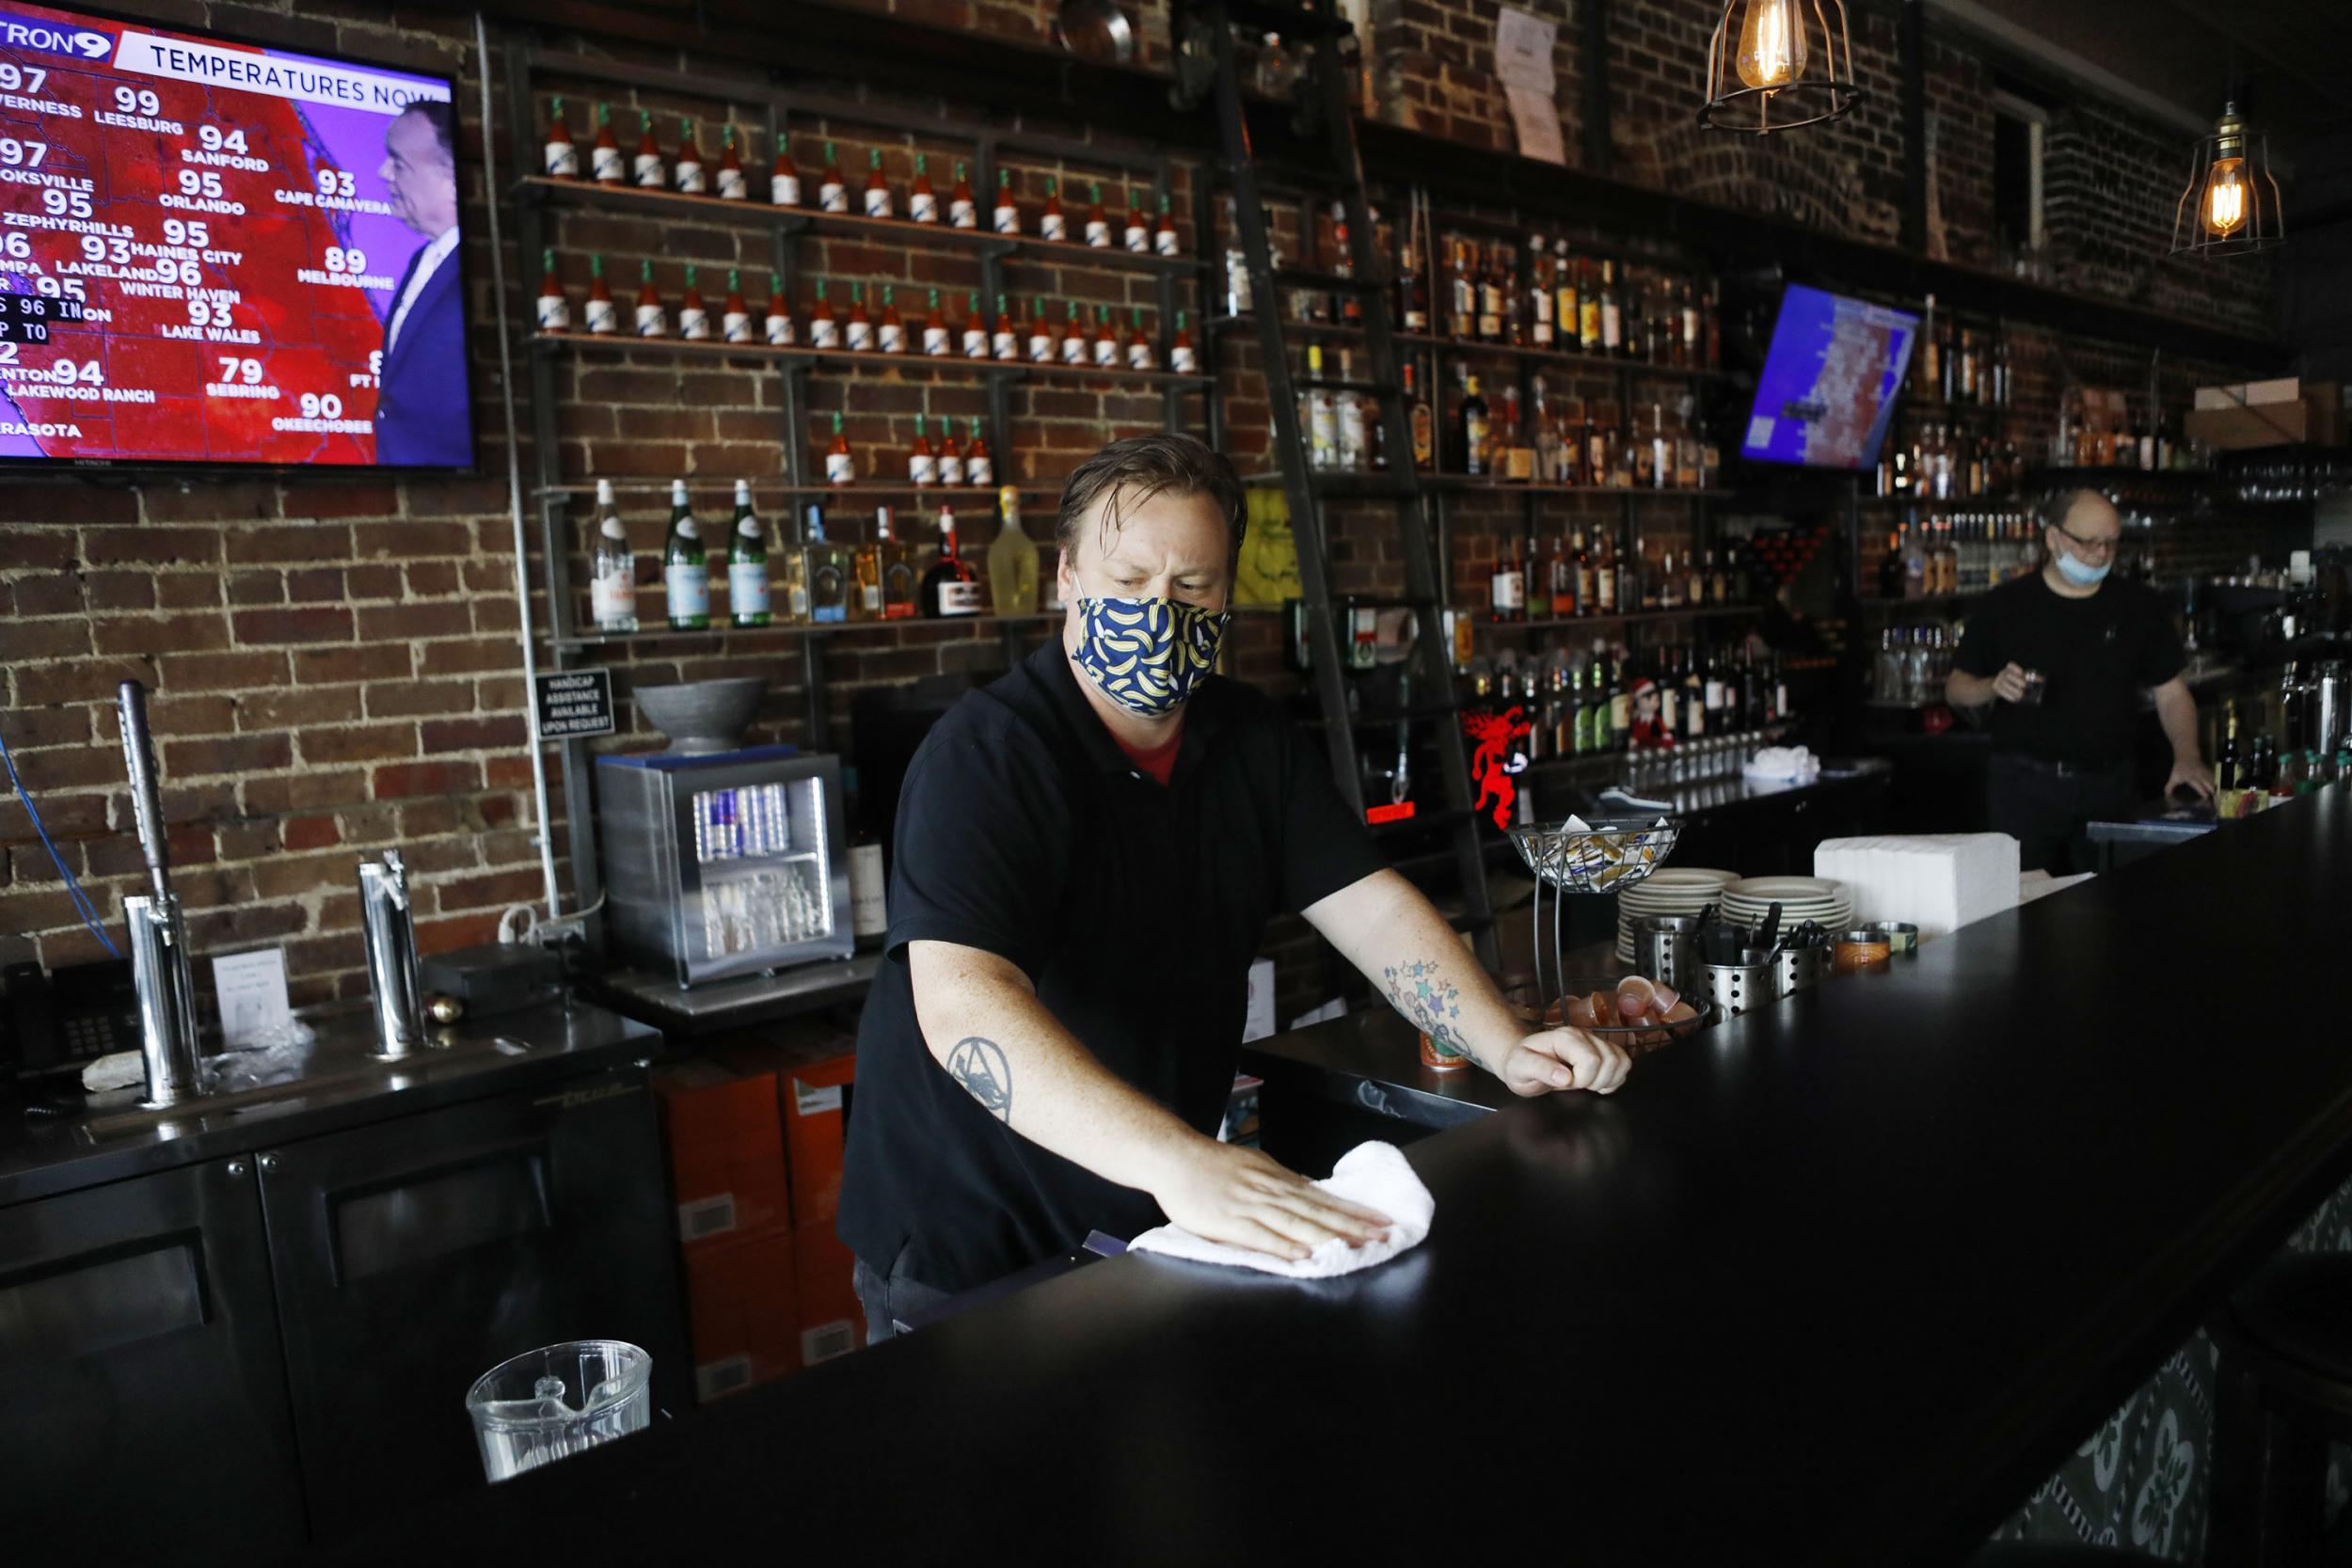 Coronavirus: Miami closes restaurants as cases continue to spike across US thumbnail